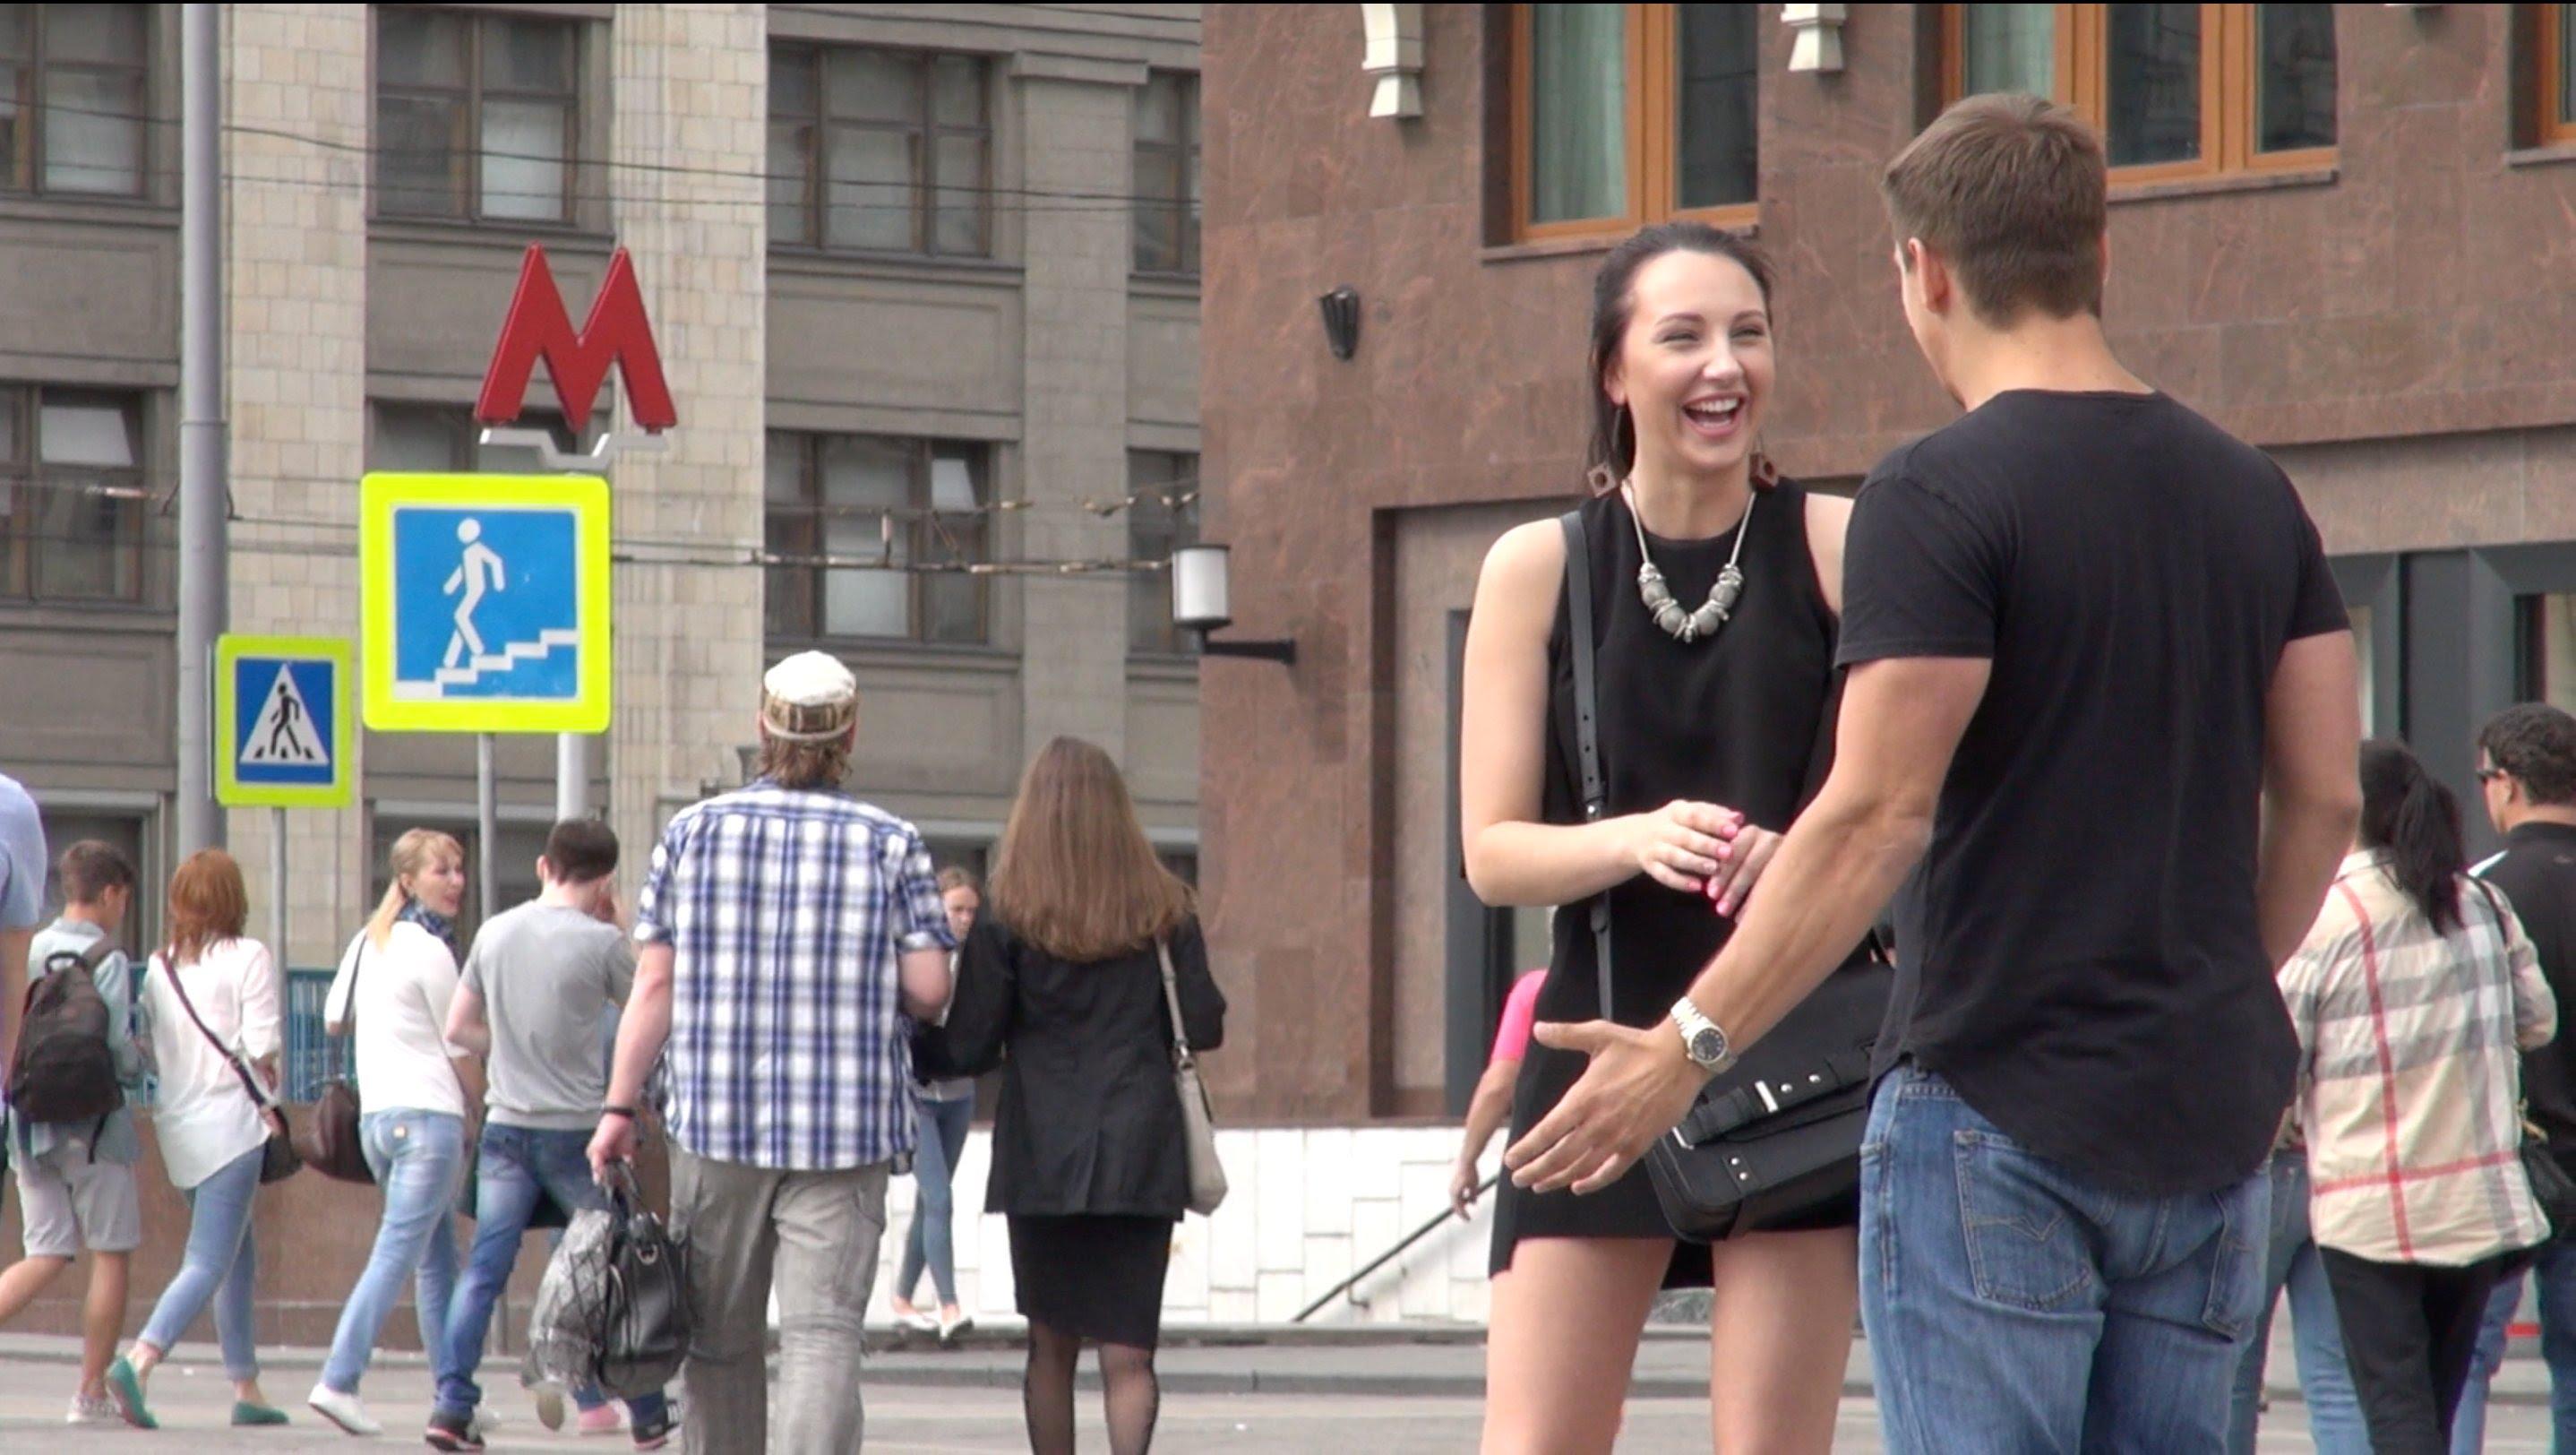 video-krasivaya-russkie-pikaperi-na-ulitsah-rossii-arbuzom